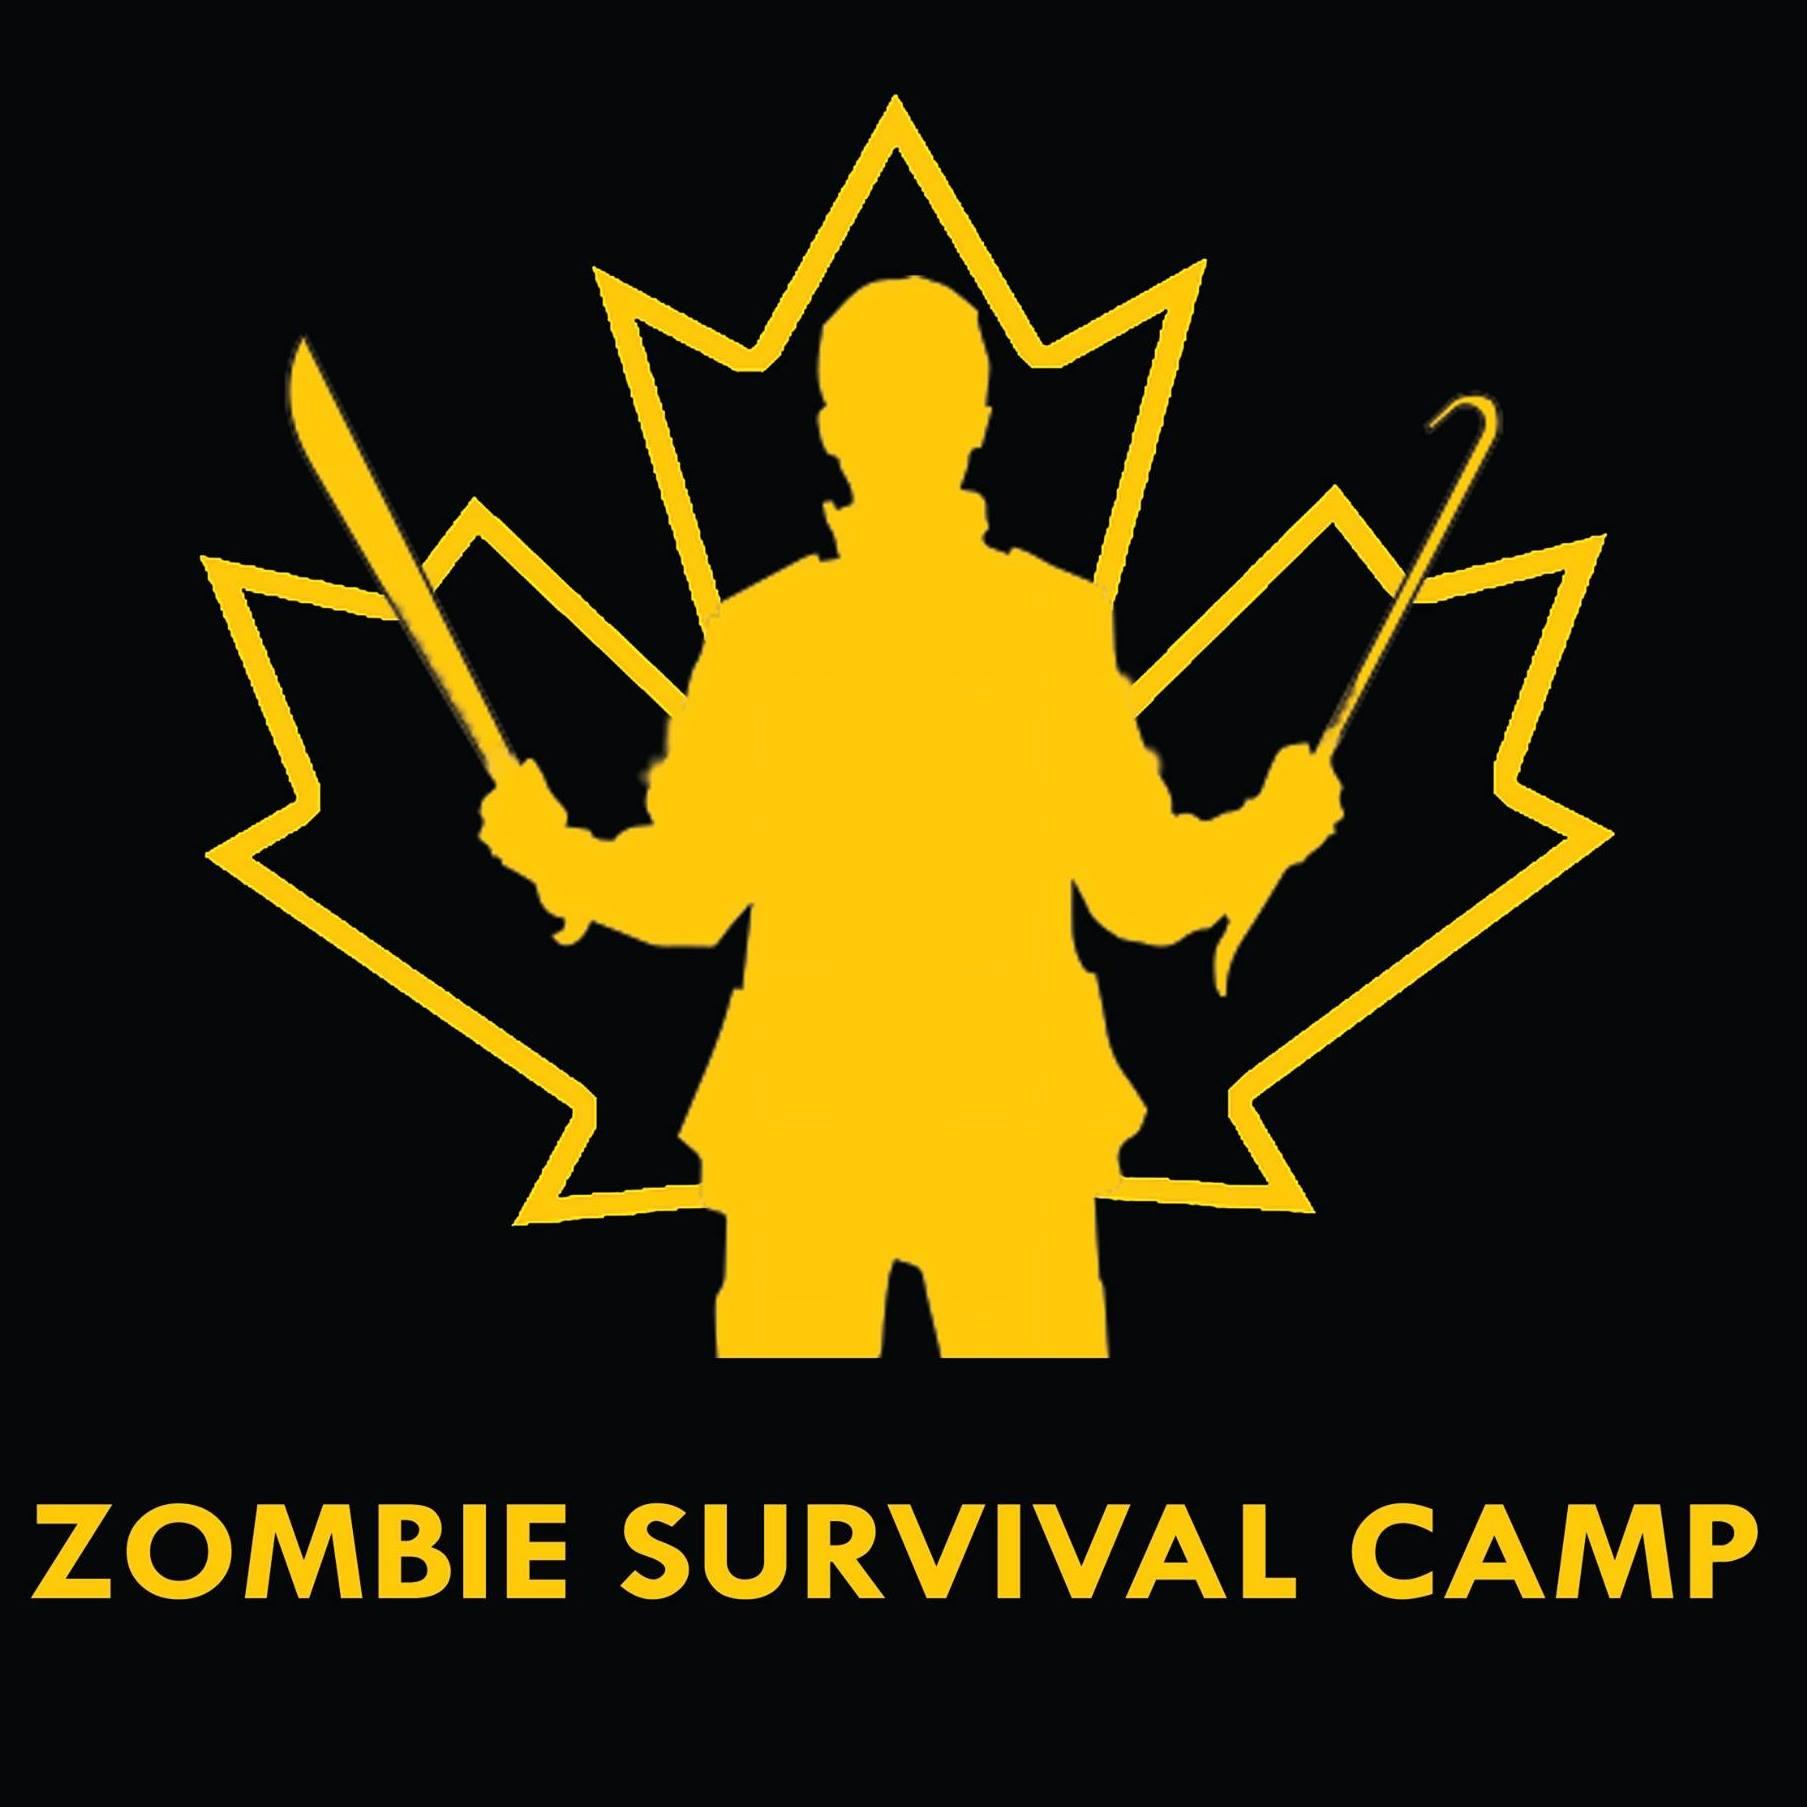 ZombieSurvivalCampSquare.jpg